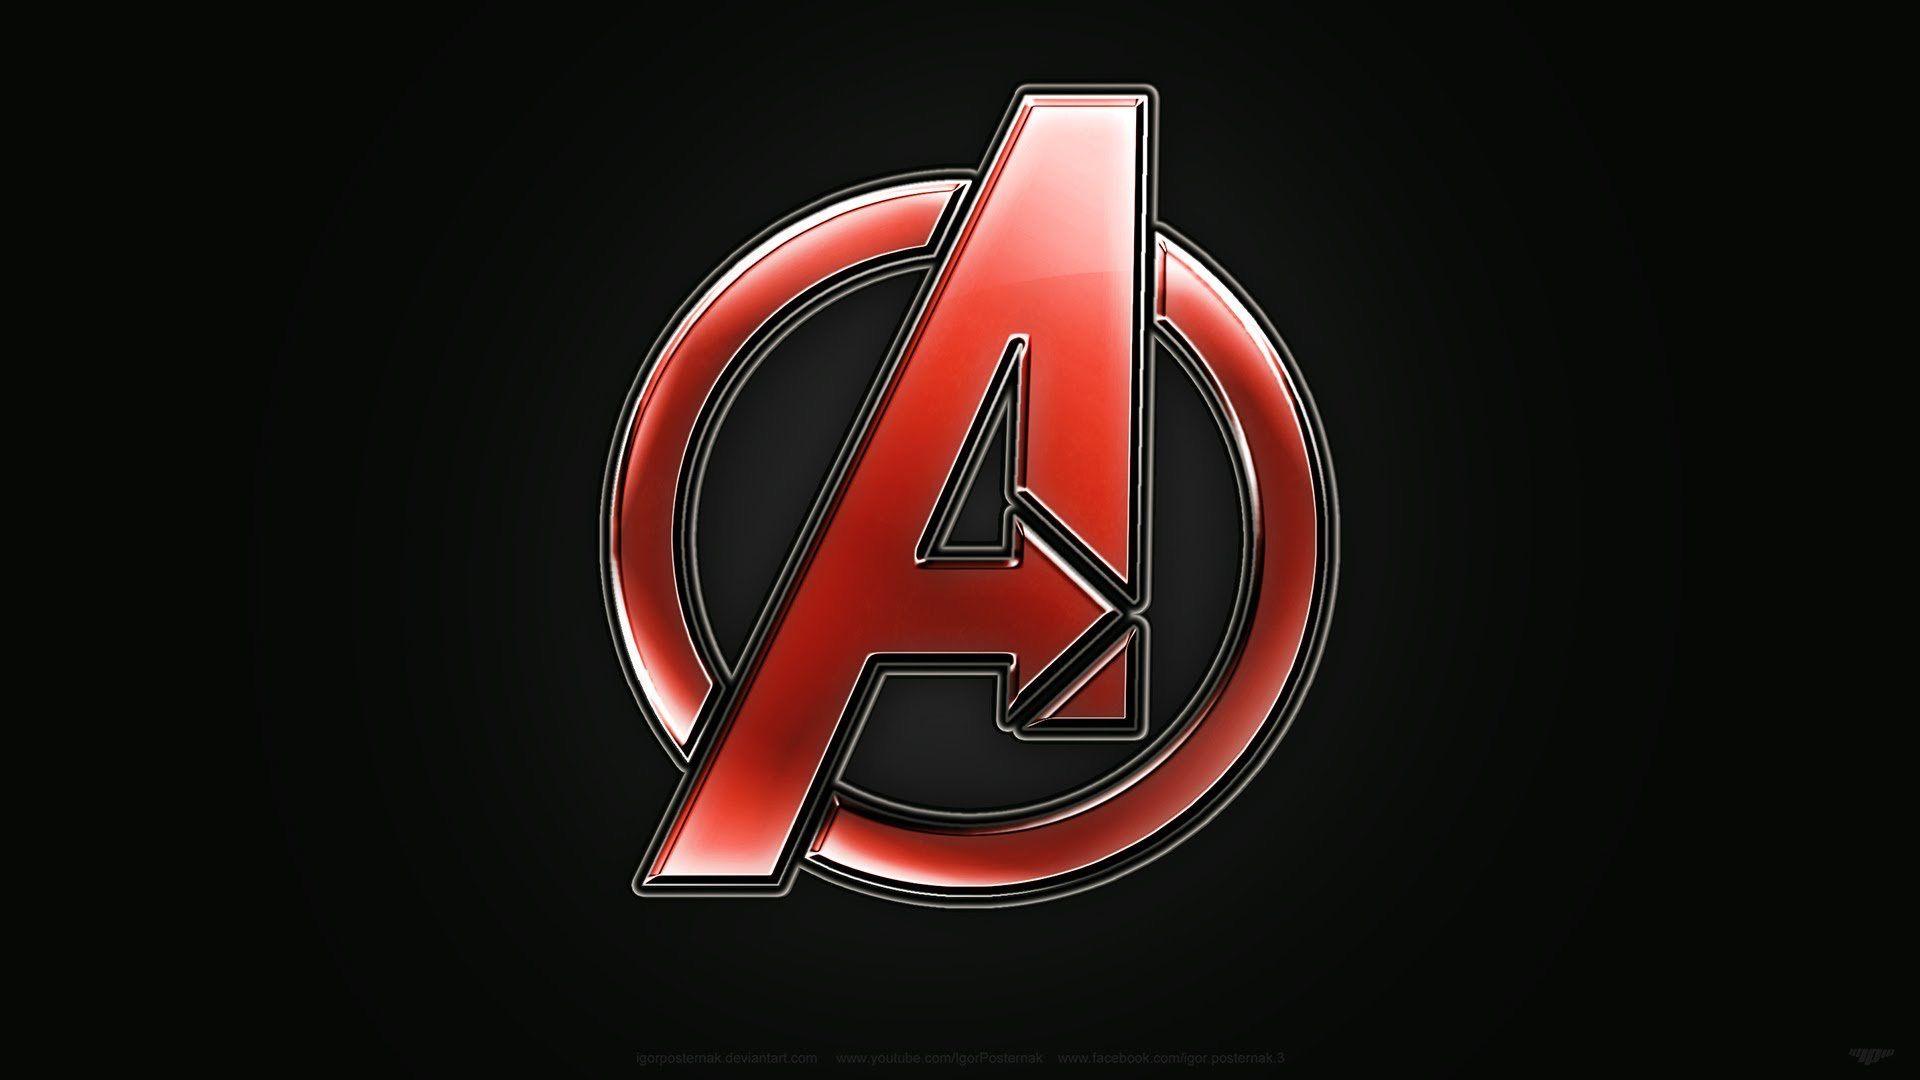 Pin by Nikola Zawadova on The Avengers+Mix pics Avengers